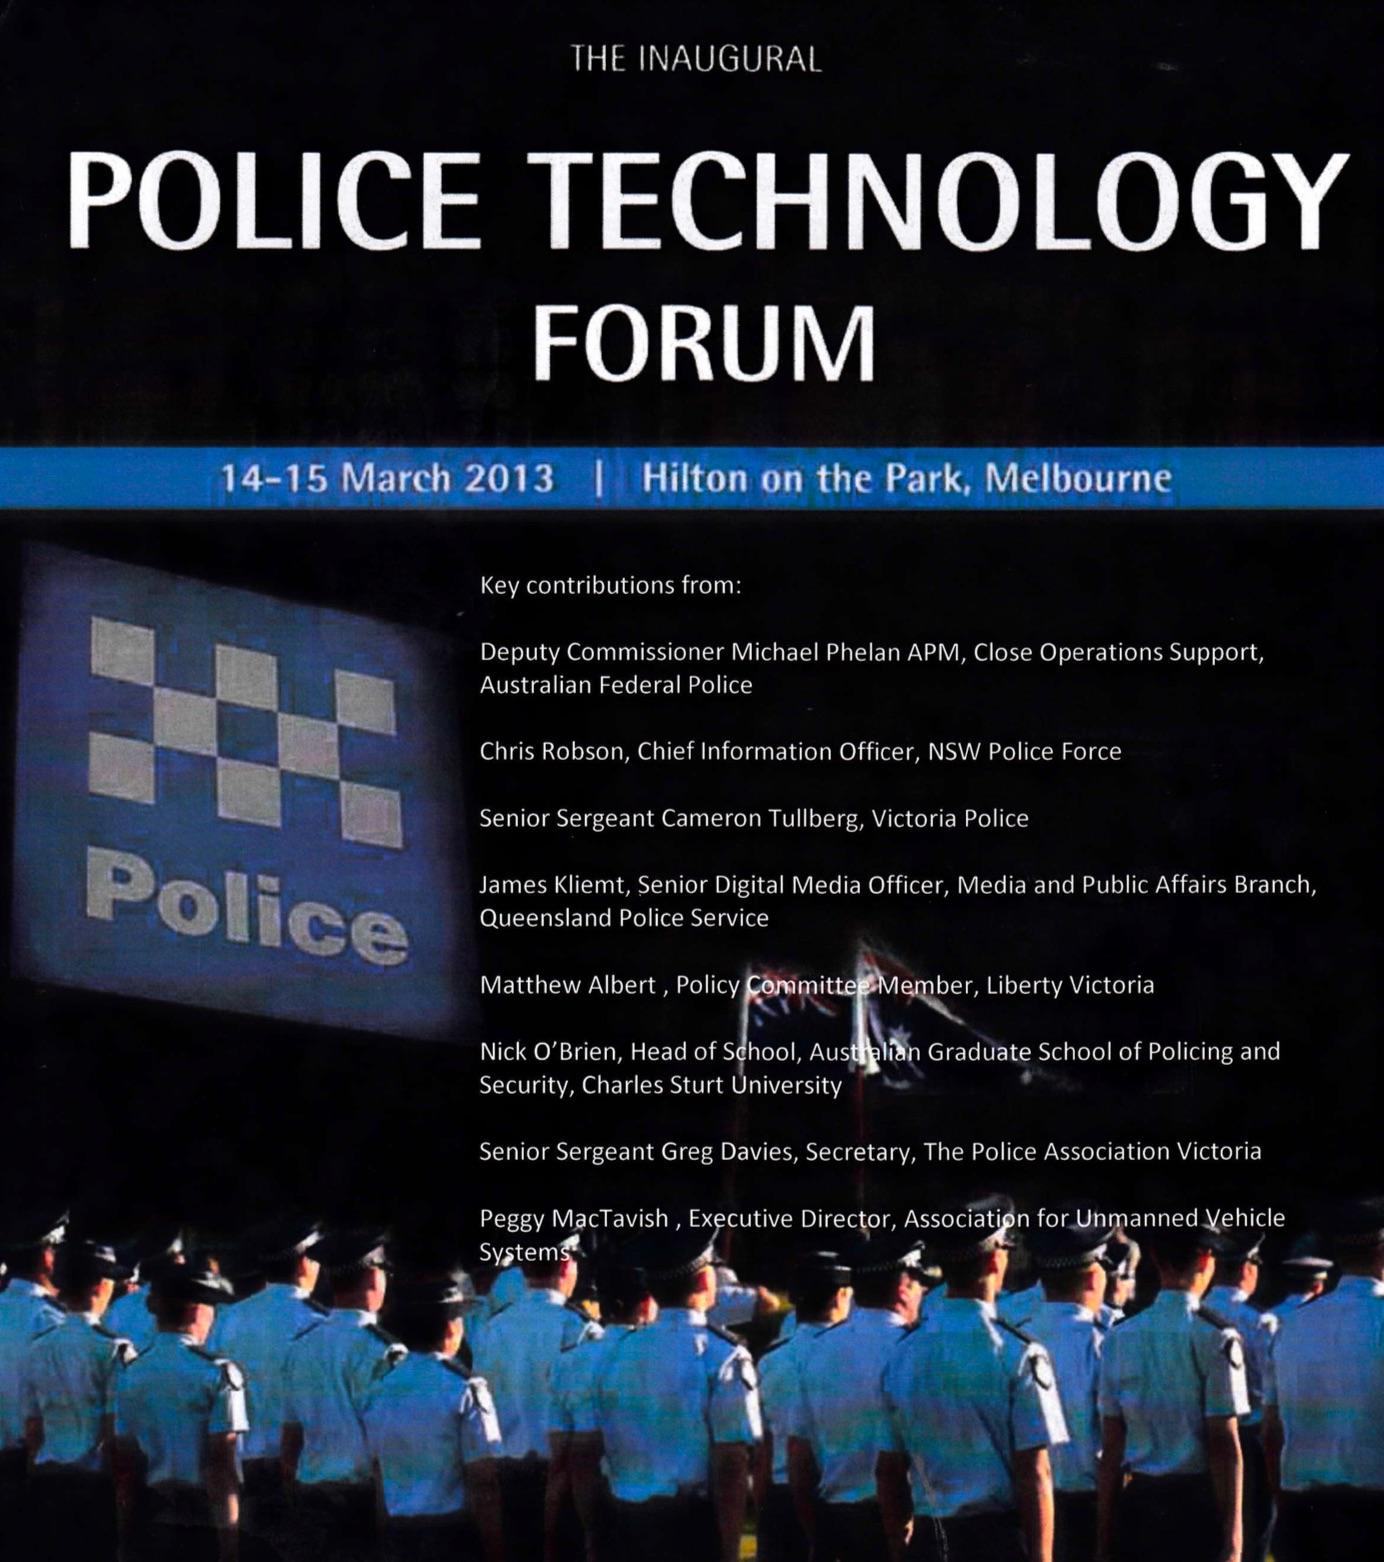 2013-03-14-Informa-Police-Tech-Forum-Program_pdf__page_8_of_16_.jpg